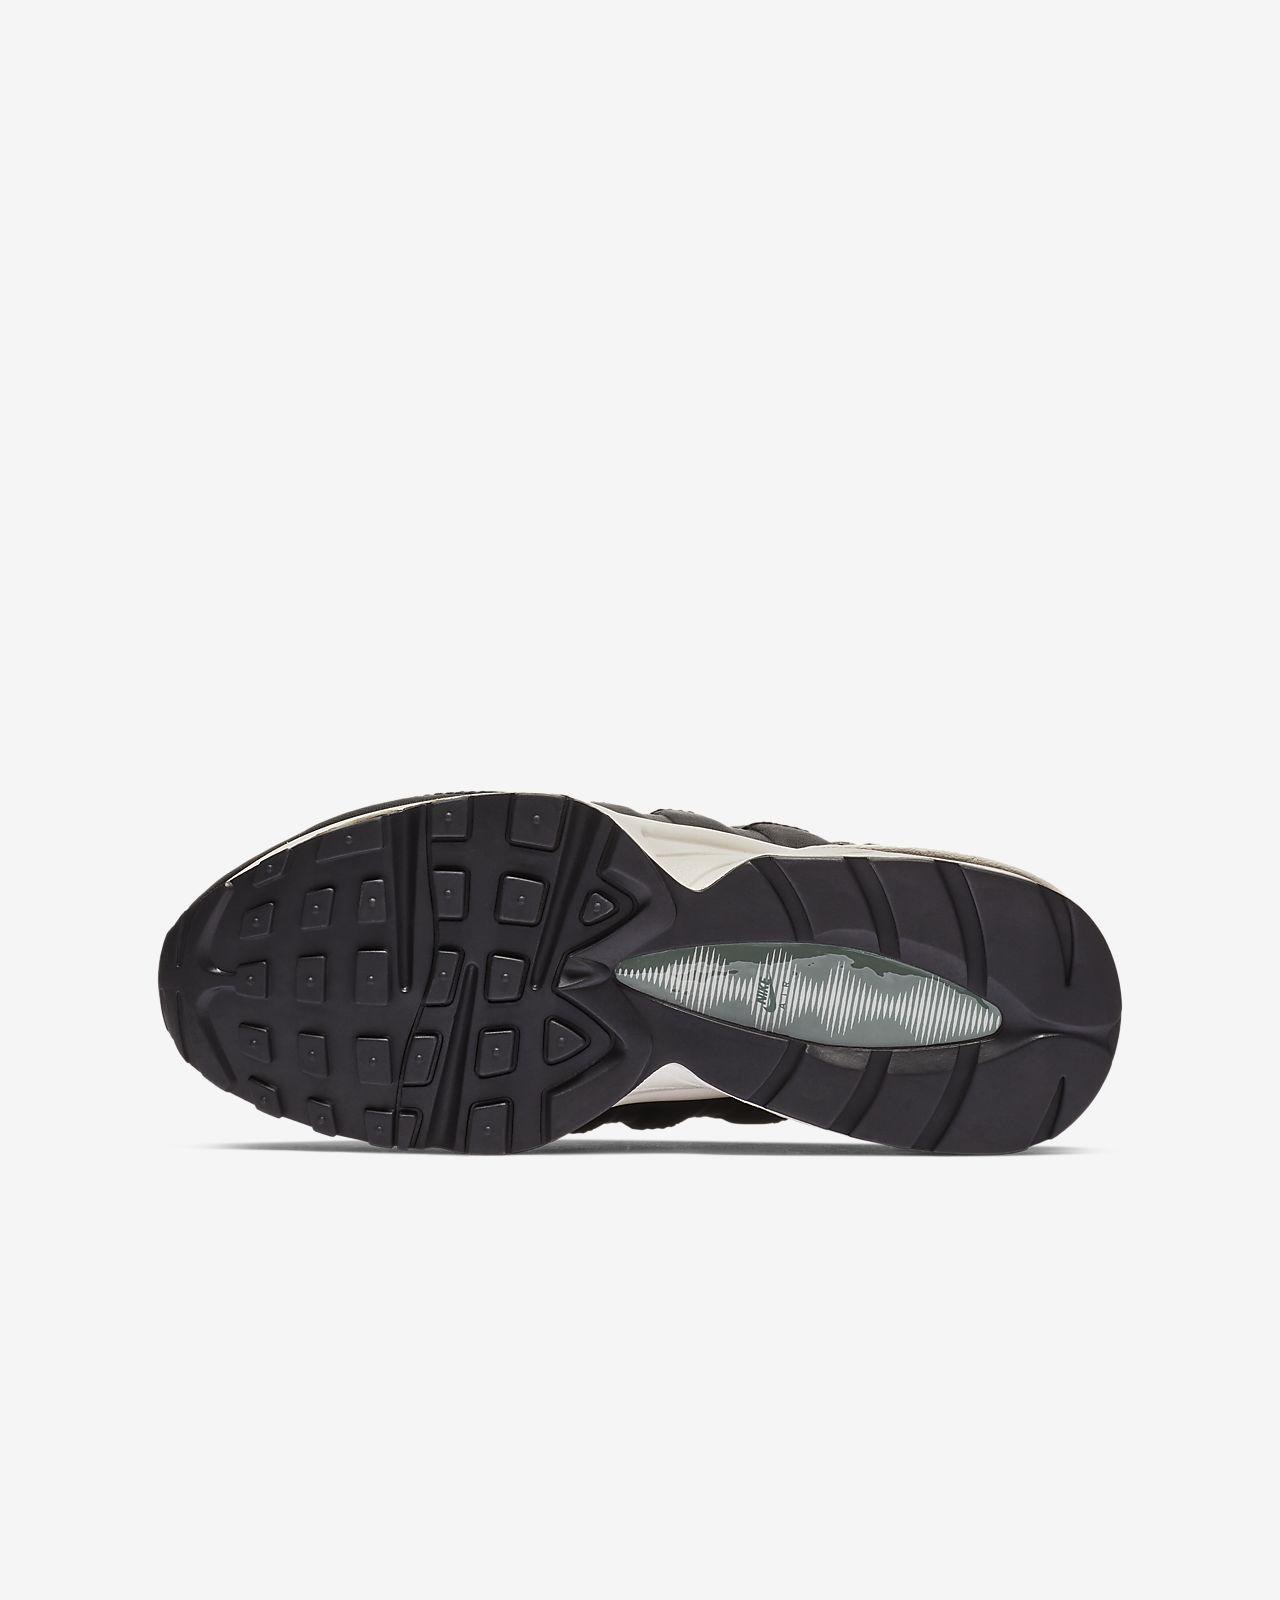 73574cfb3095d8 Nike Air Max 95 Big Kids  Shoe. Nike.com